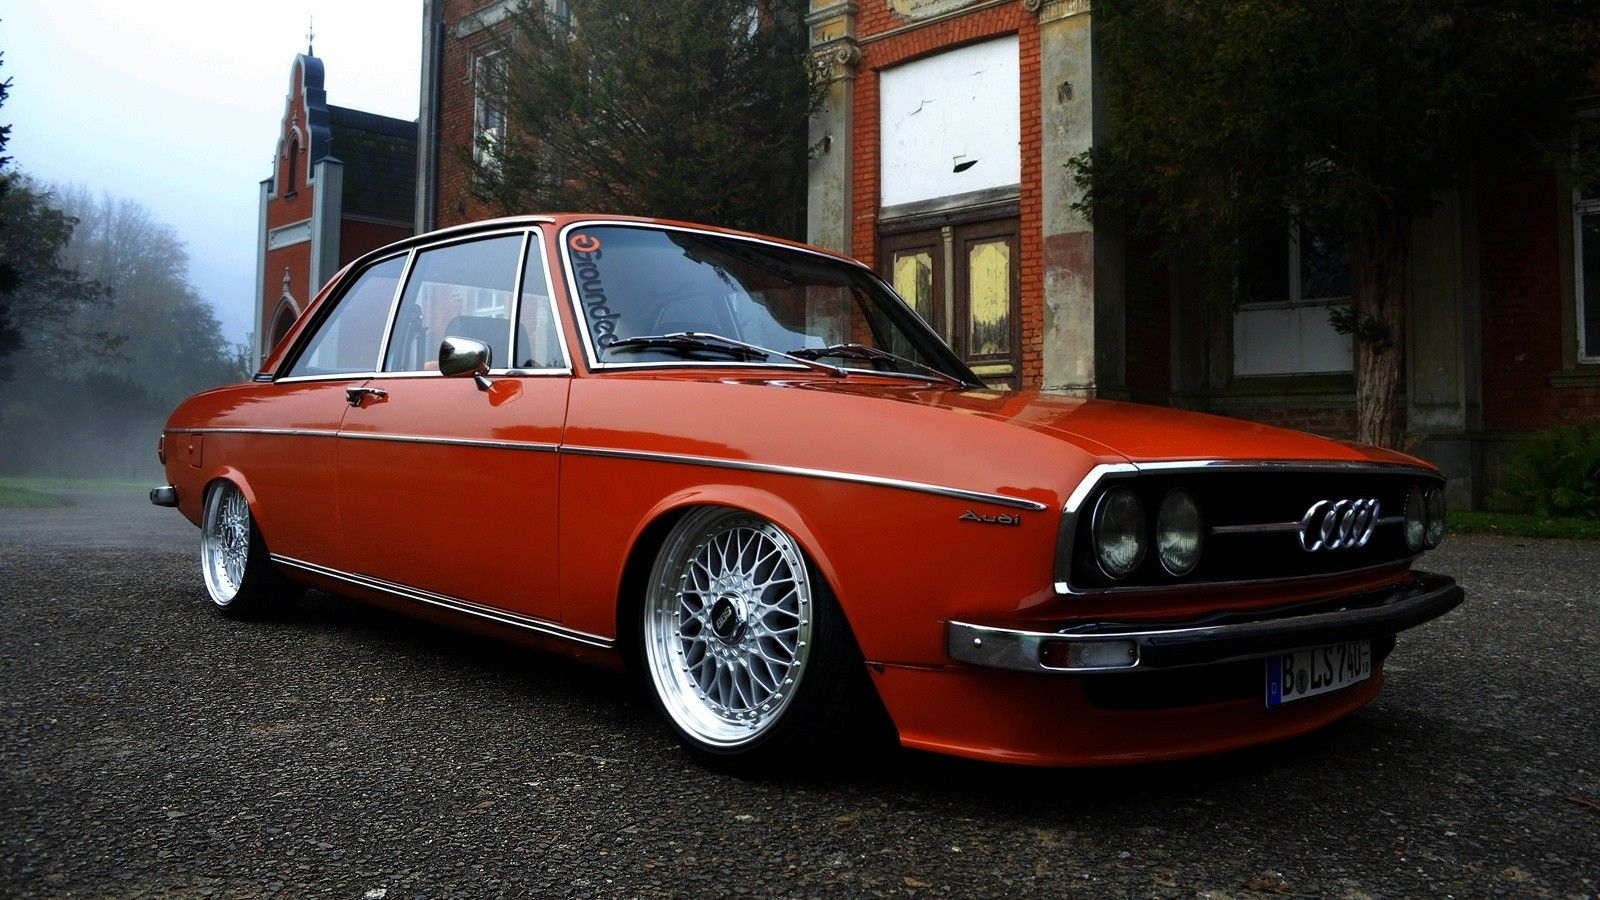 80-audi-b1-classic-classic-car-slammed.jpg (1600×900)   CARology ...